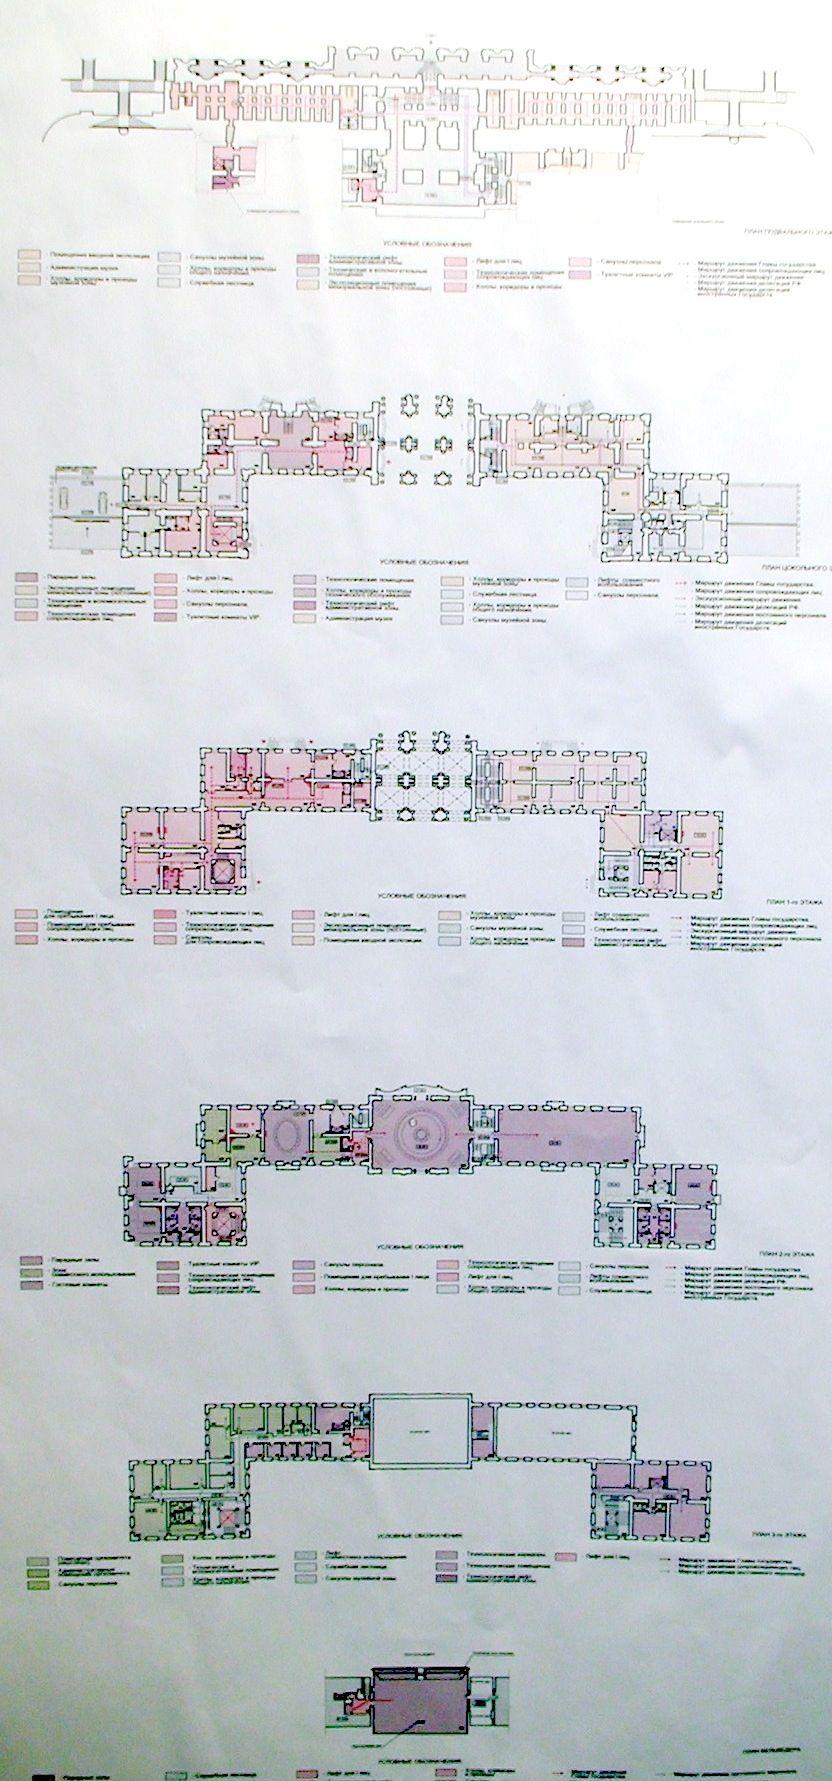 Floorplans of Konstantin Palace, Strelna, Russia.